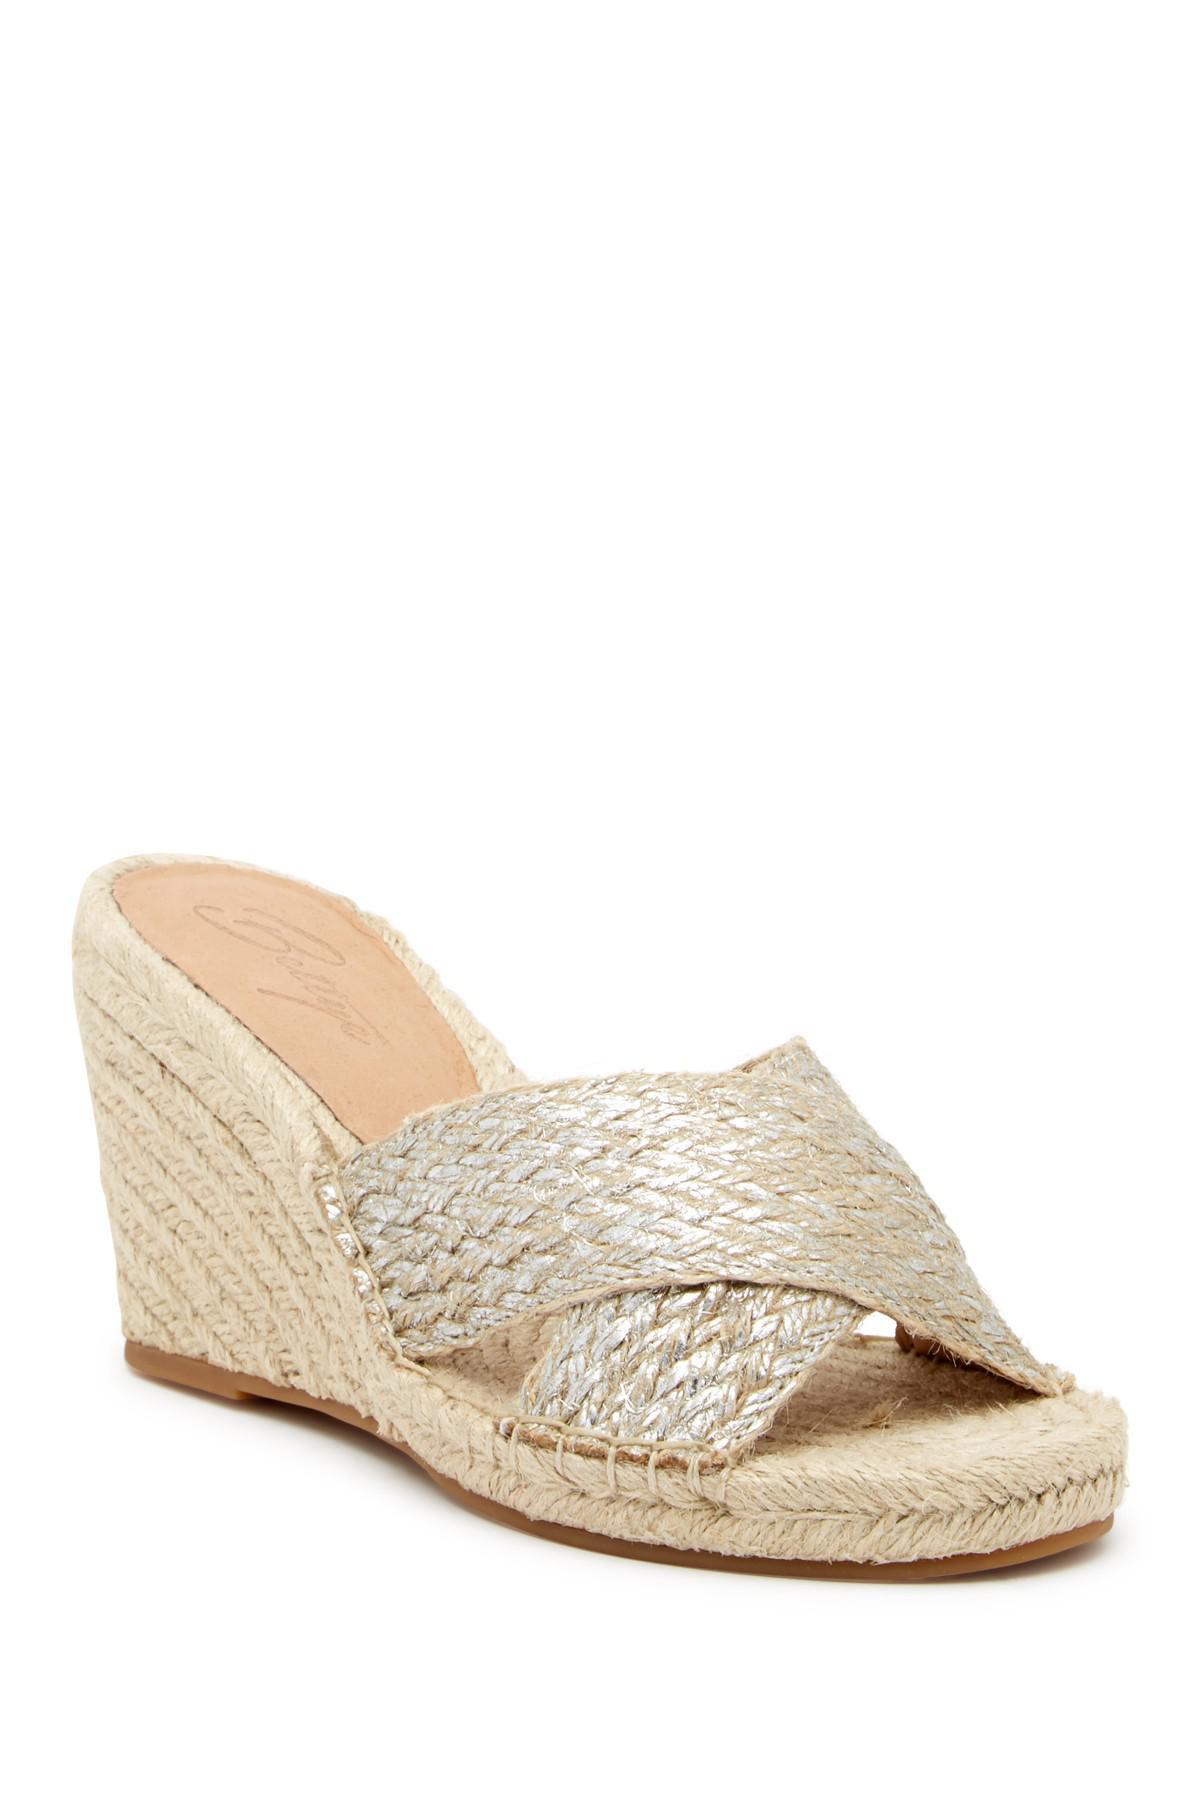 bc4fdc8d0 Lyst - Bettye Muller Hanna Jute Rope Wedge Sandal in Metallic